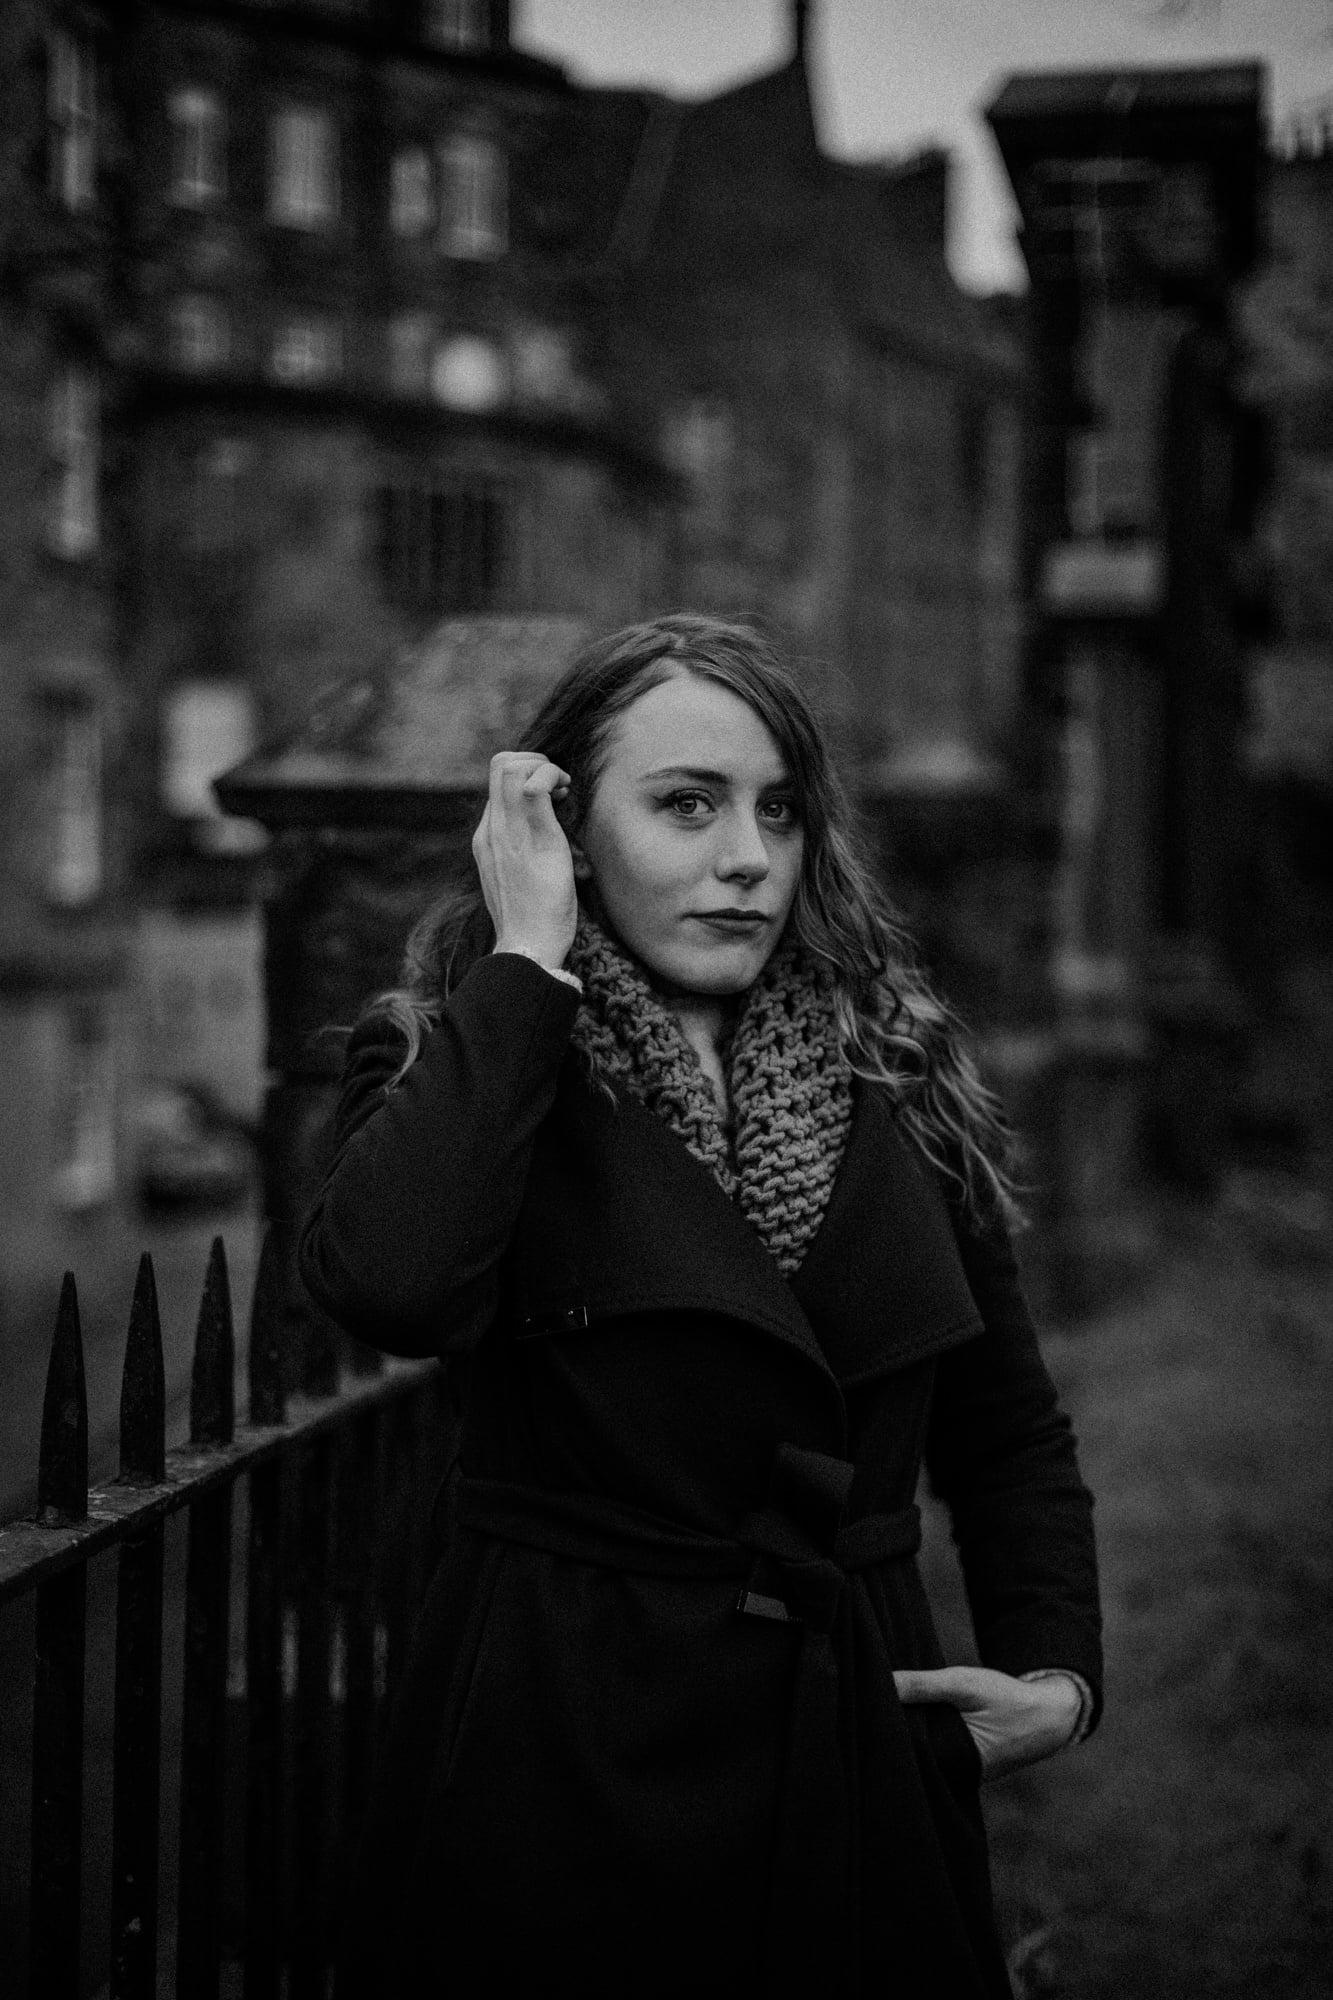 Winter portrait photoshoot in Edinburgh Old Town